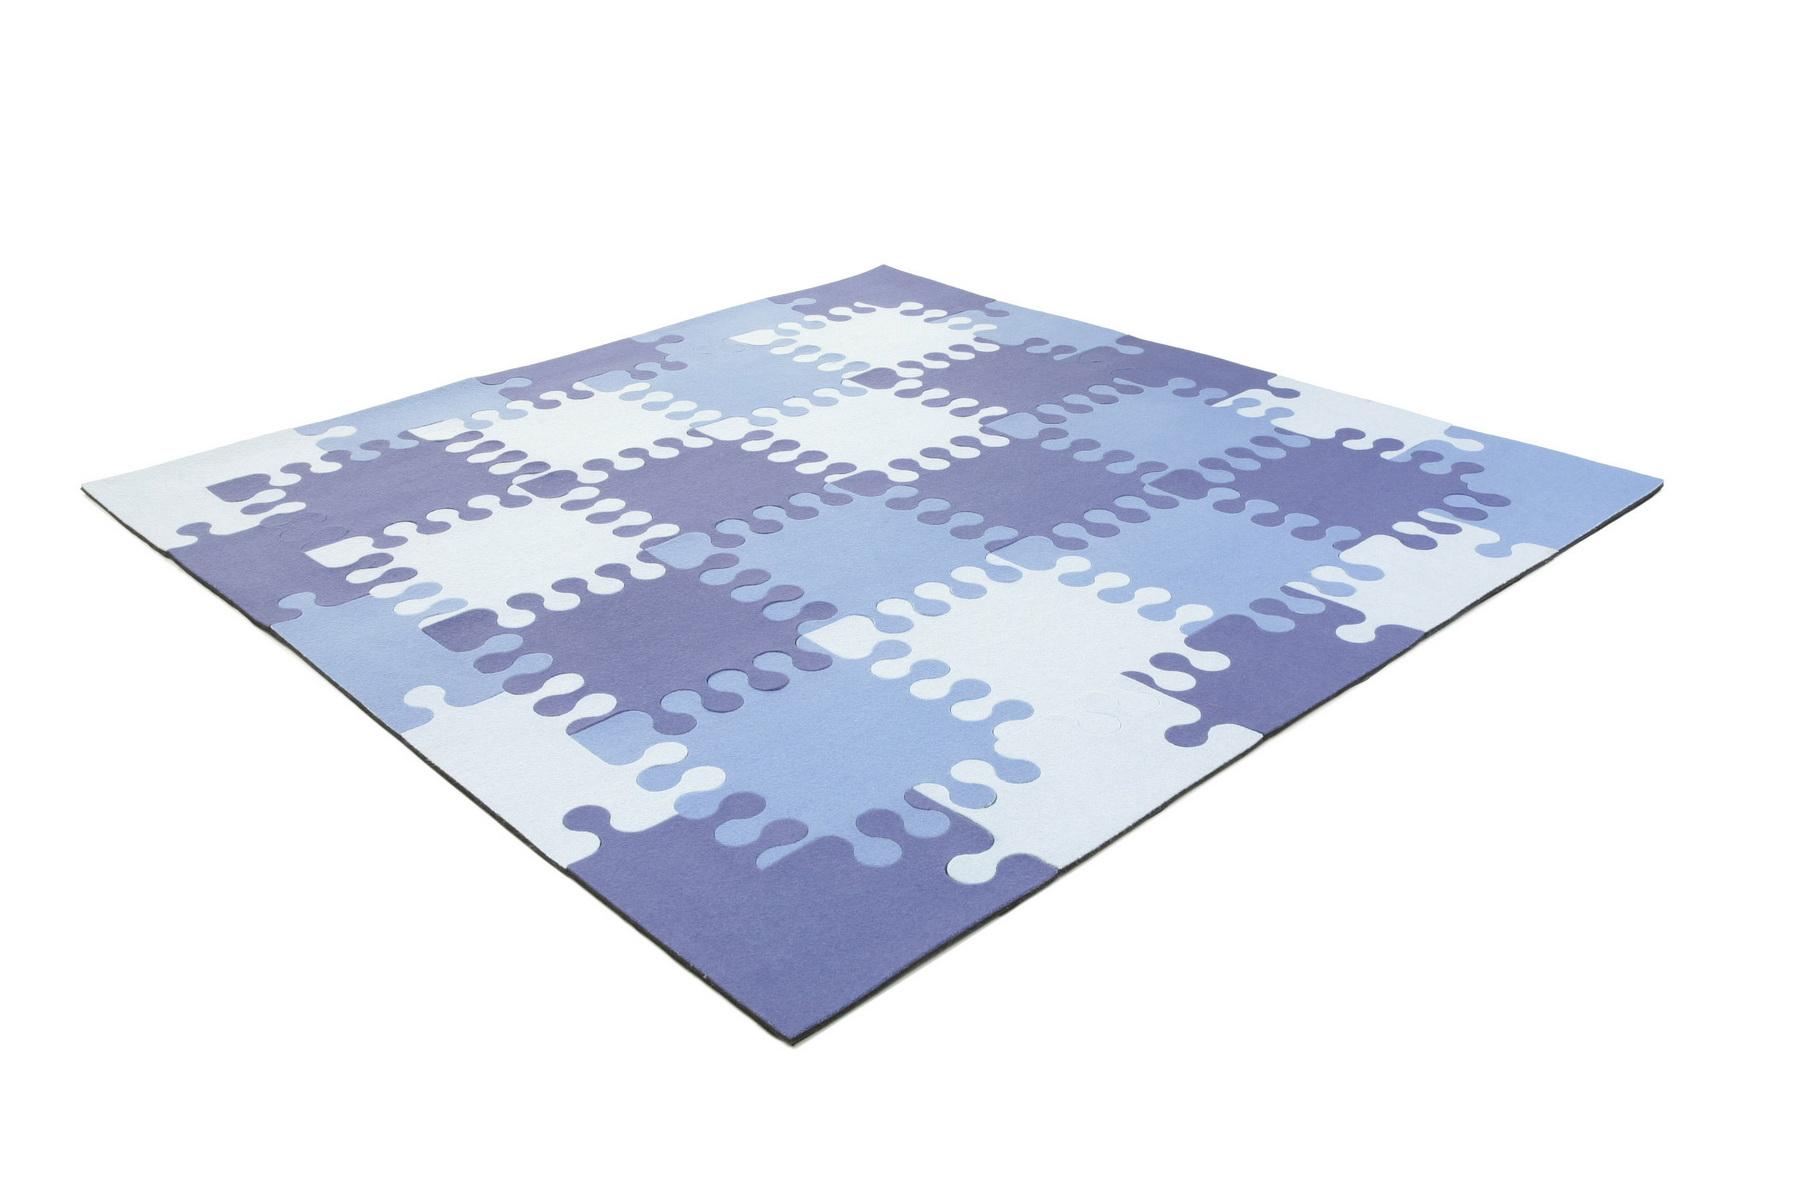 classics of wool de teppich puzzle blue. Black Bedroom Furniture Sets. Home Design Ideas